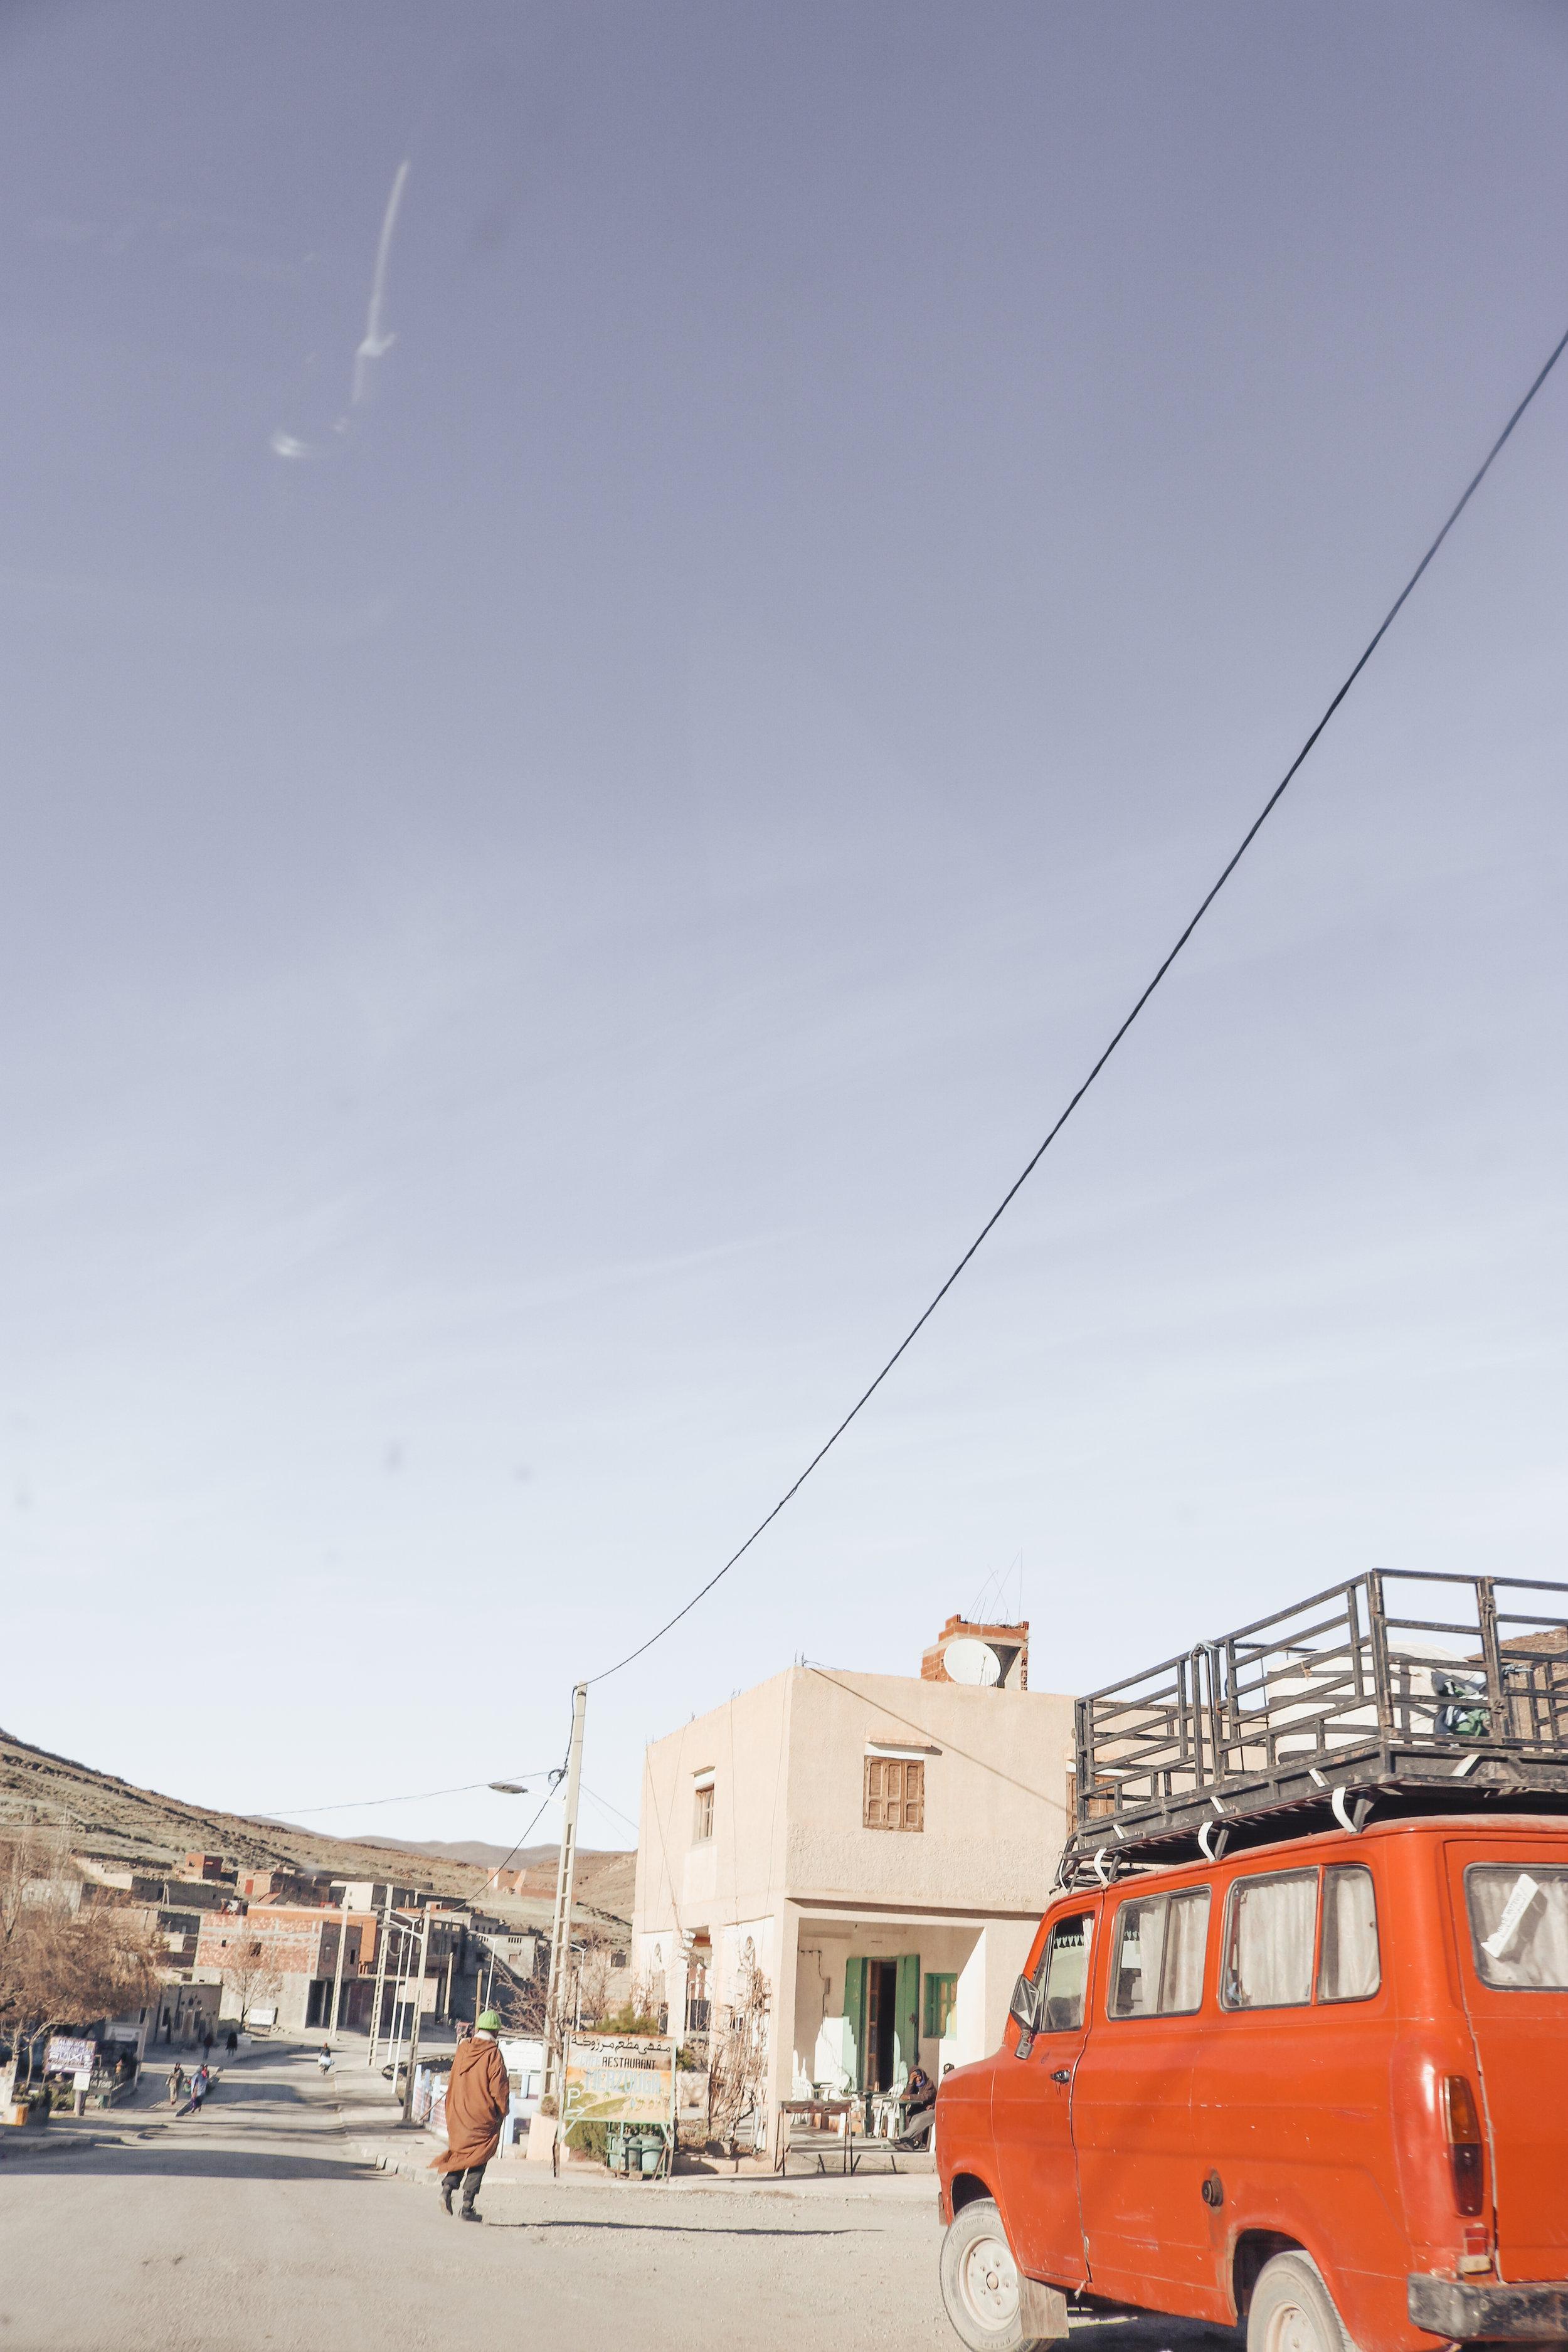 morocco-trip- (1 of 1).jpg